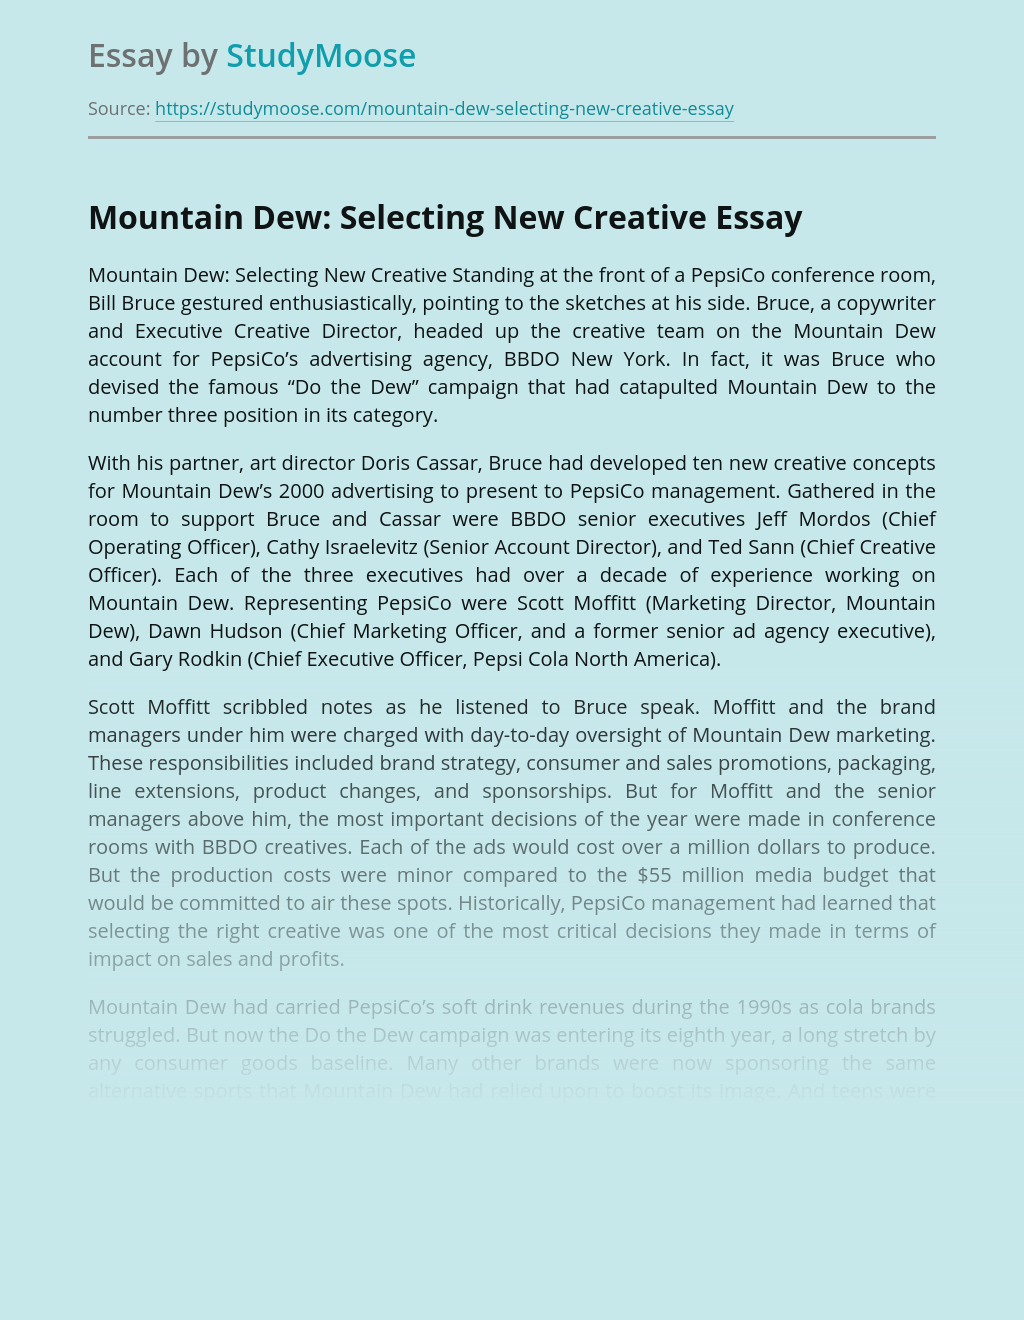 Mountain Dew: Selecting New Creative